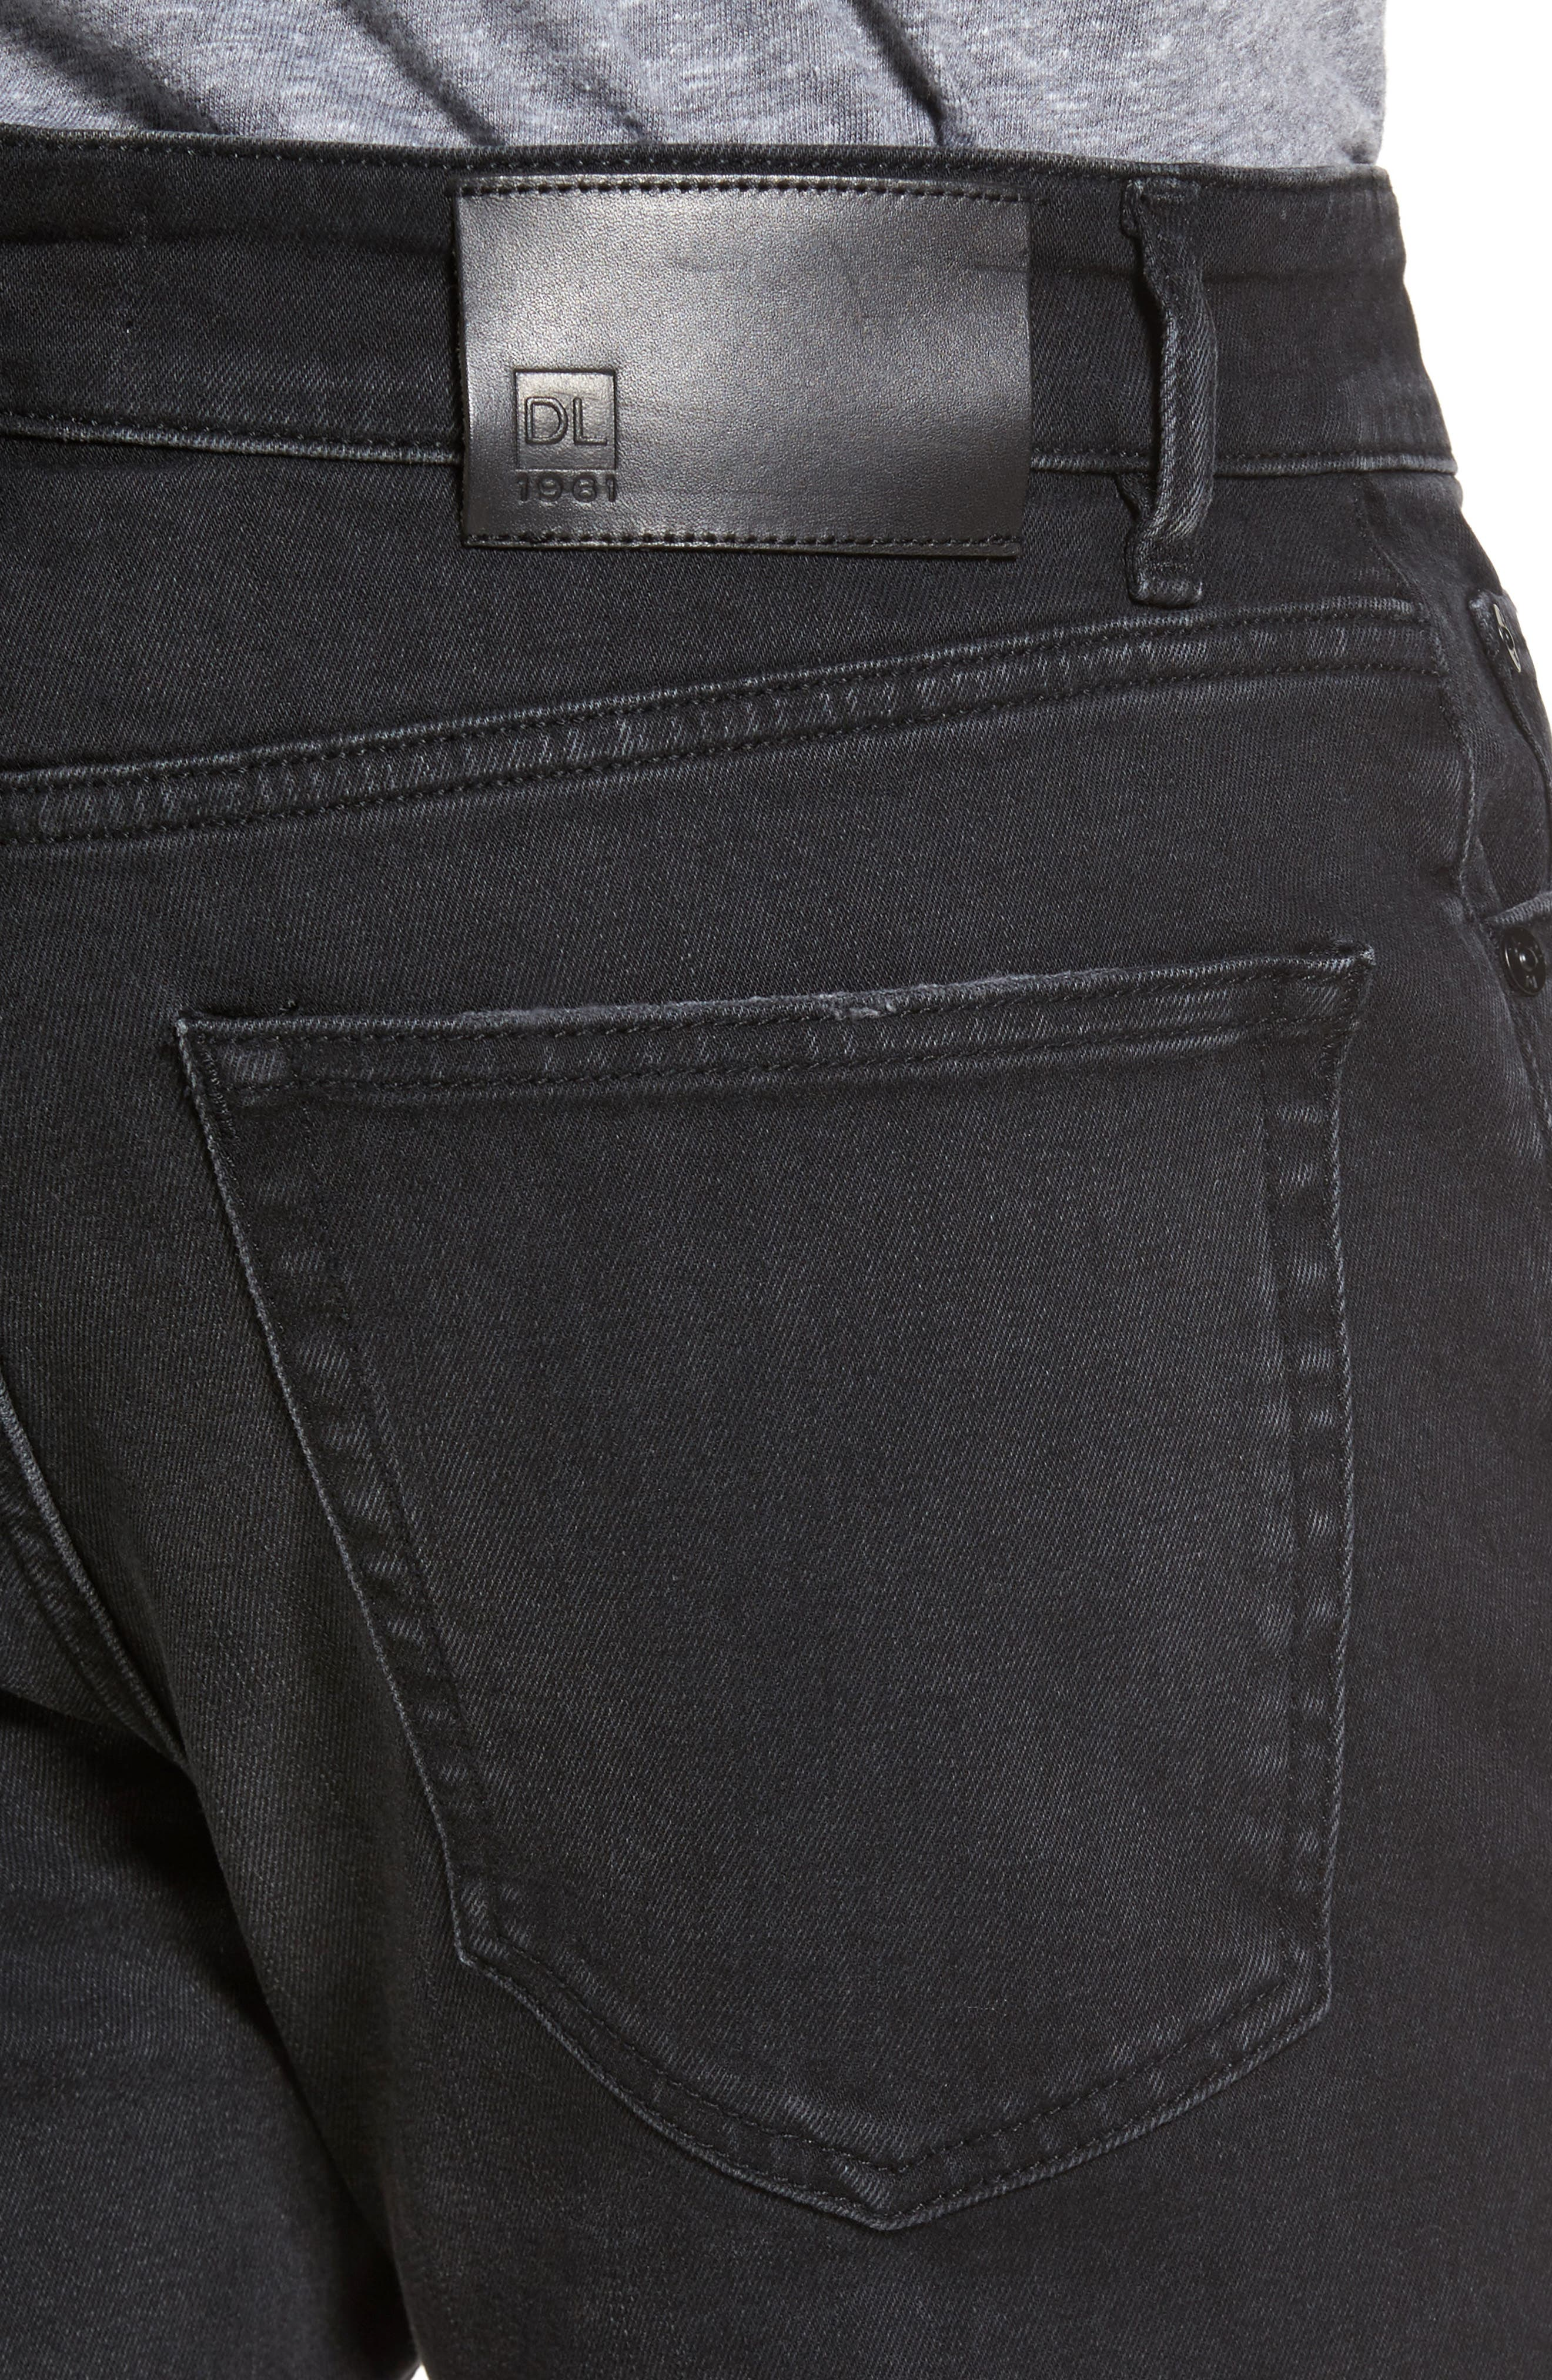 Hunter Skinny Jeans,                             Alternate thumbnail 4, color,                             001